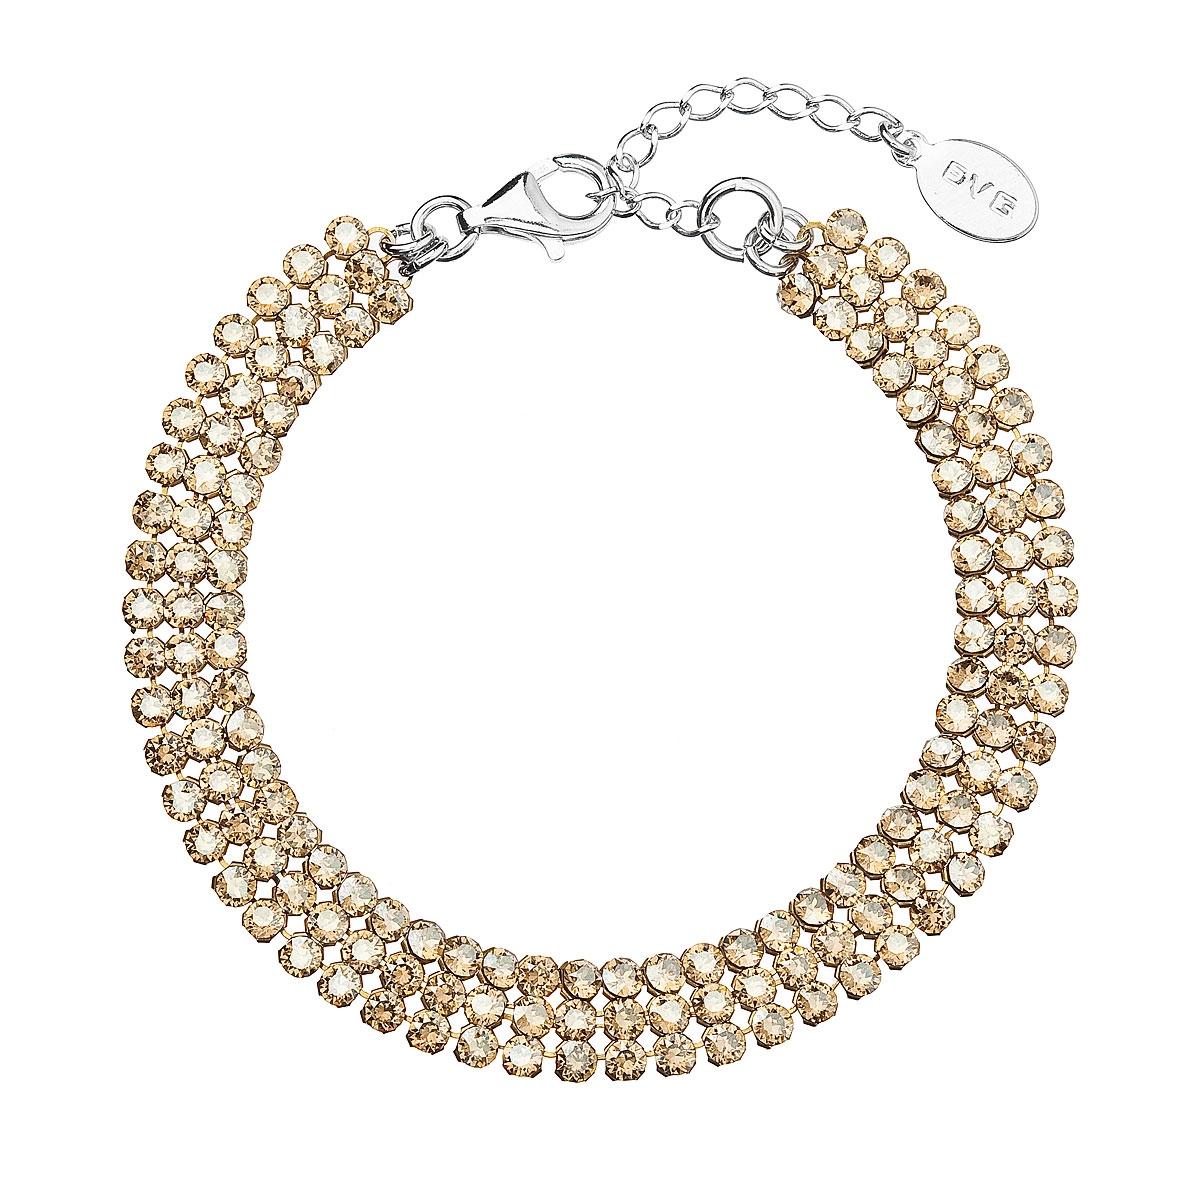 Stříbrný náramek s hnědými krystaly Crystals from Swarovski® EG7056-GD